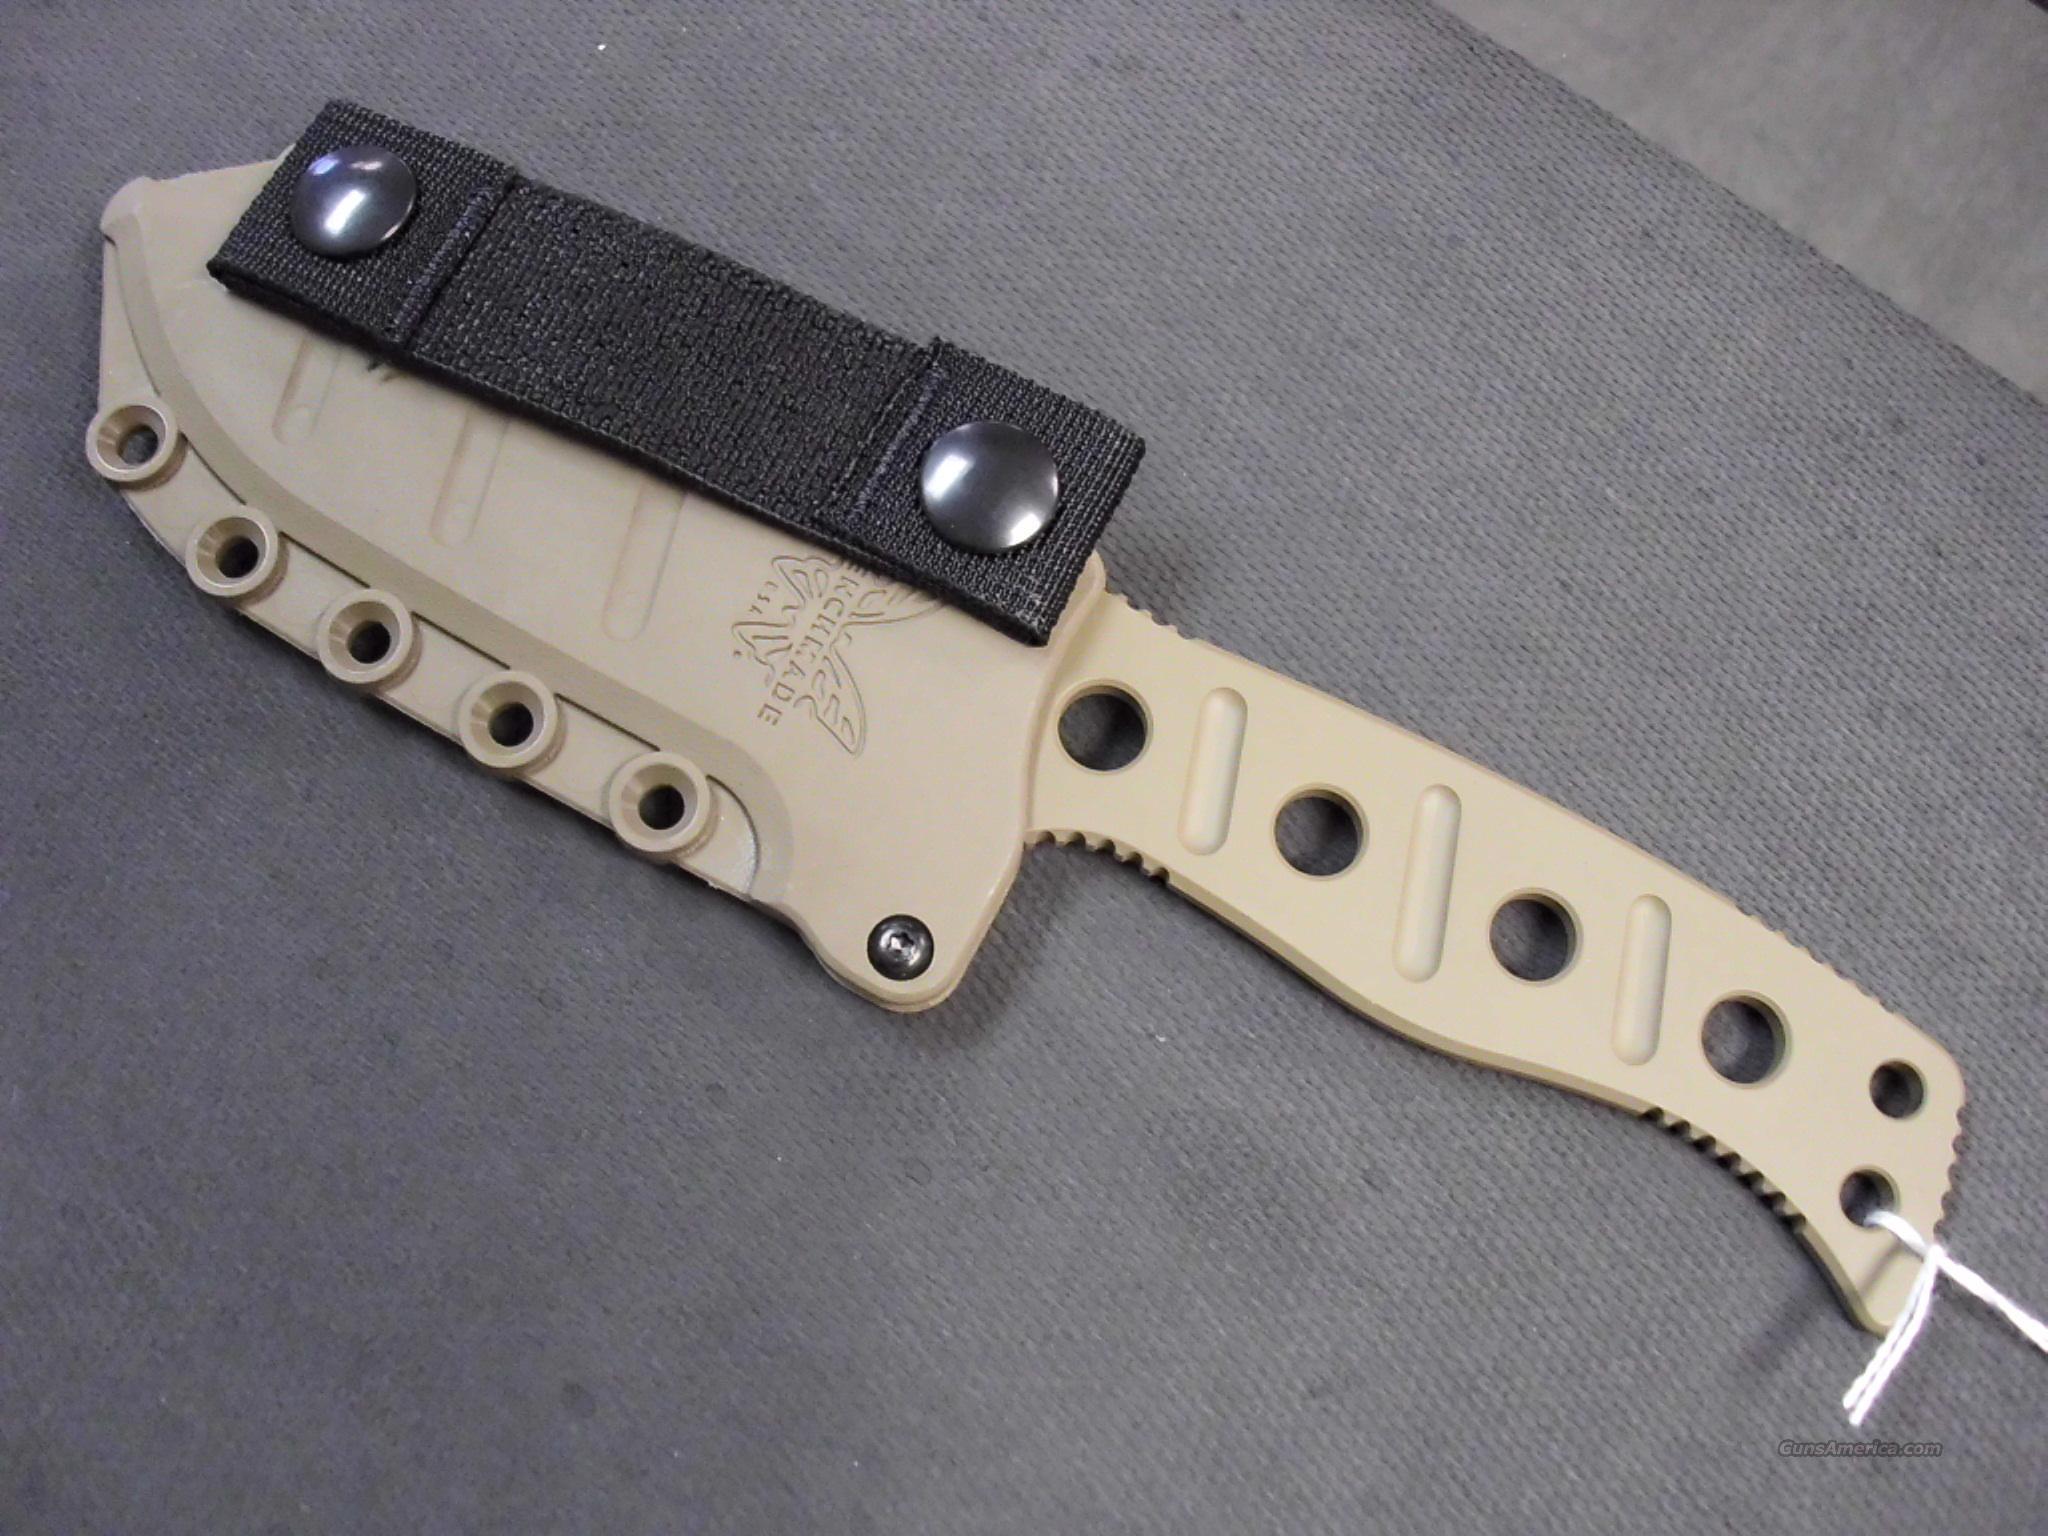 Benchmade 375SN Sibert, Fixed Adamas NEW  Non-Guns > Knives/Swords > Knives > Fixed Blade > Hand Made